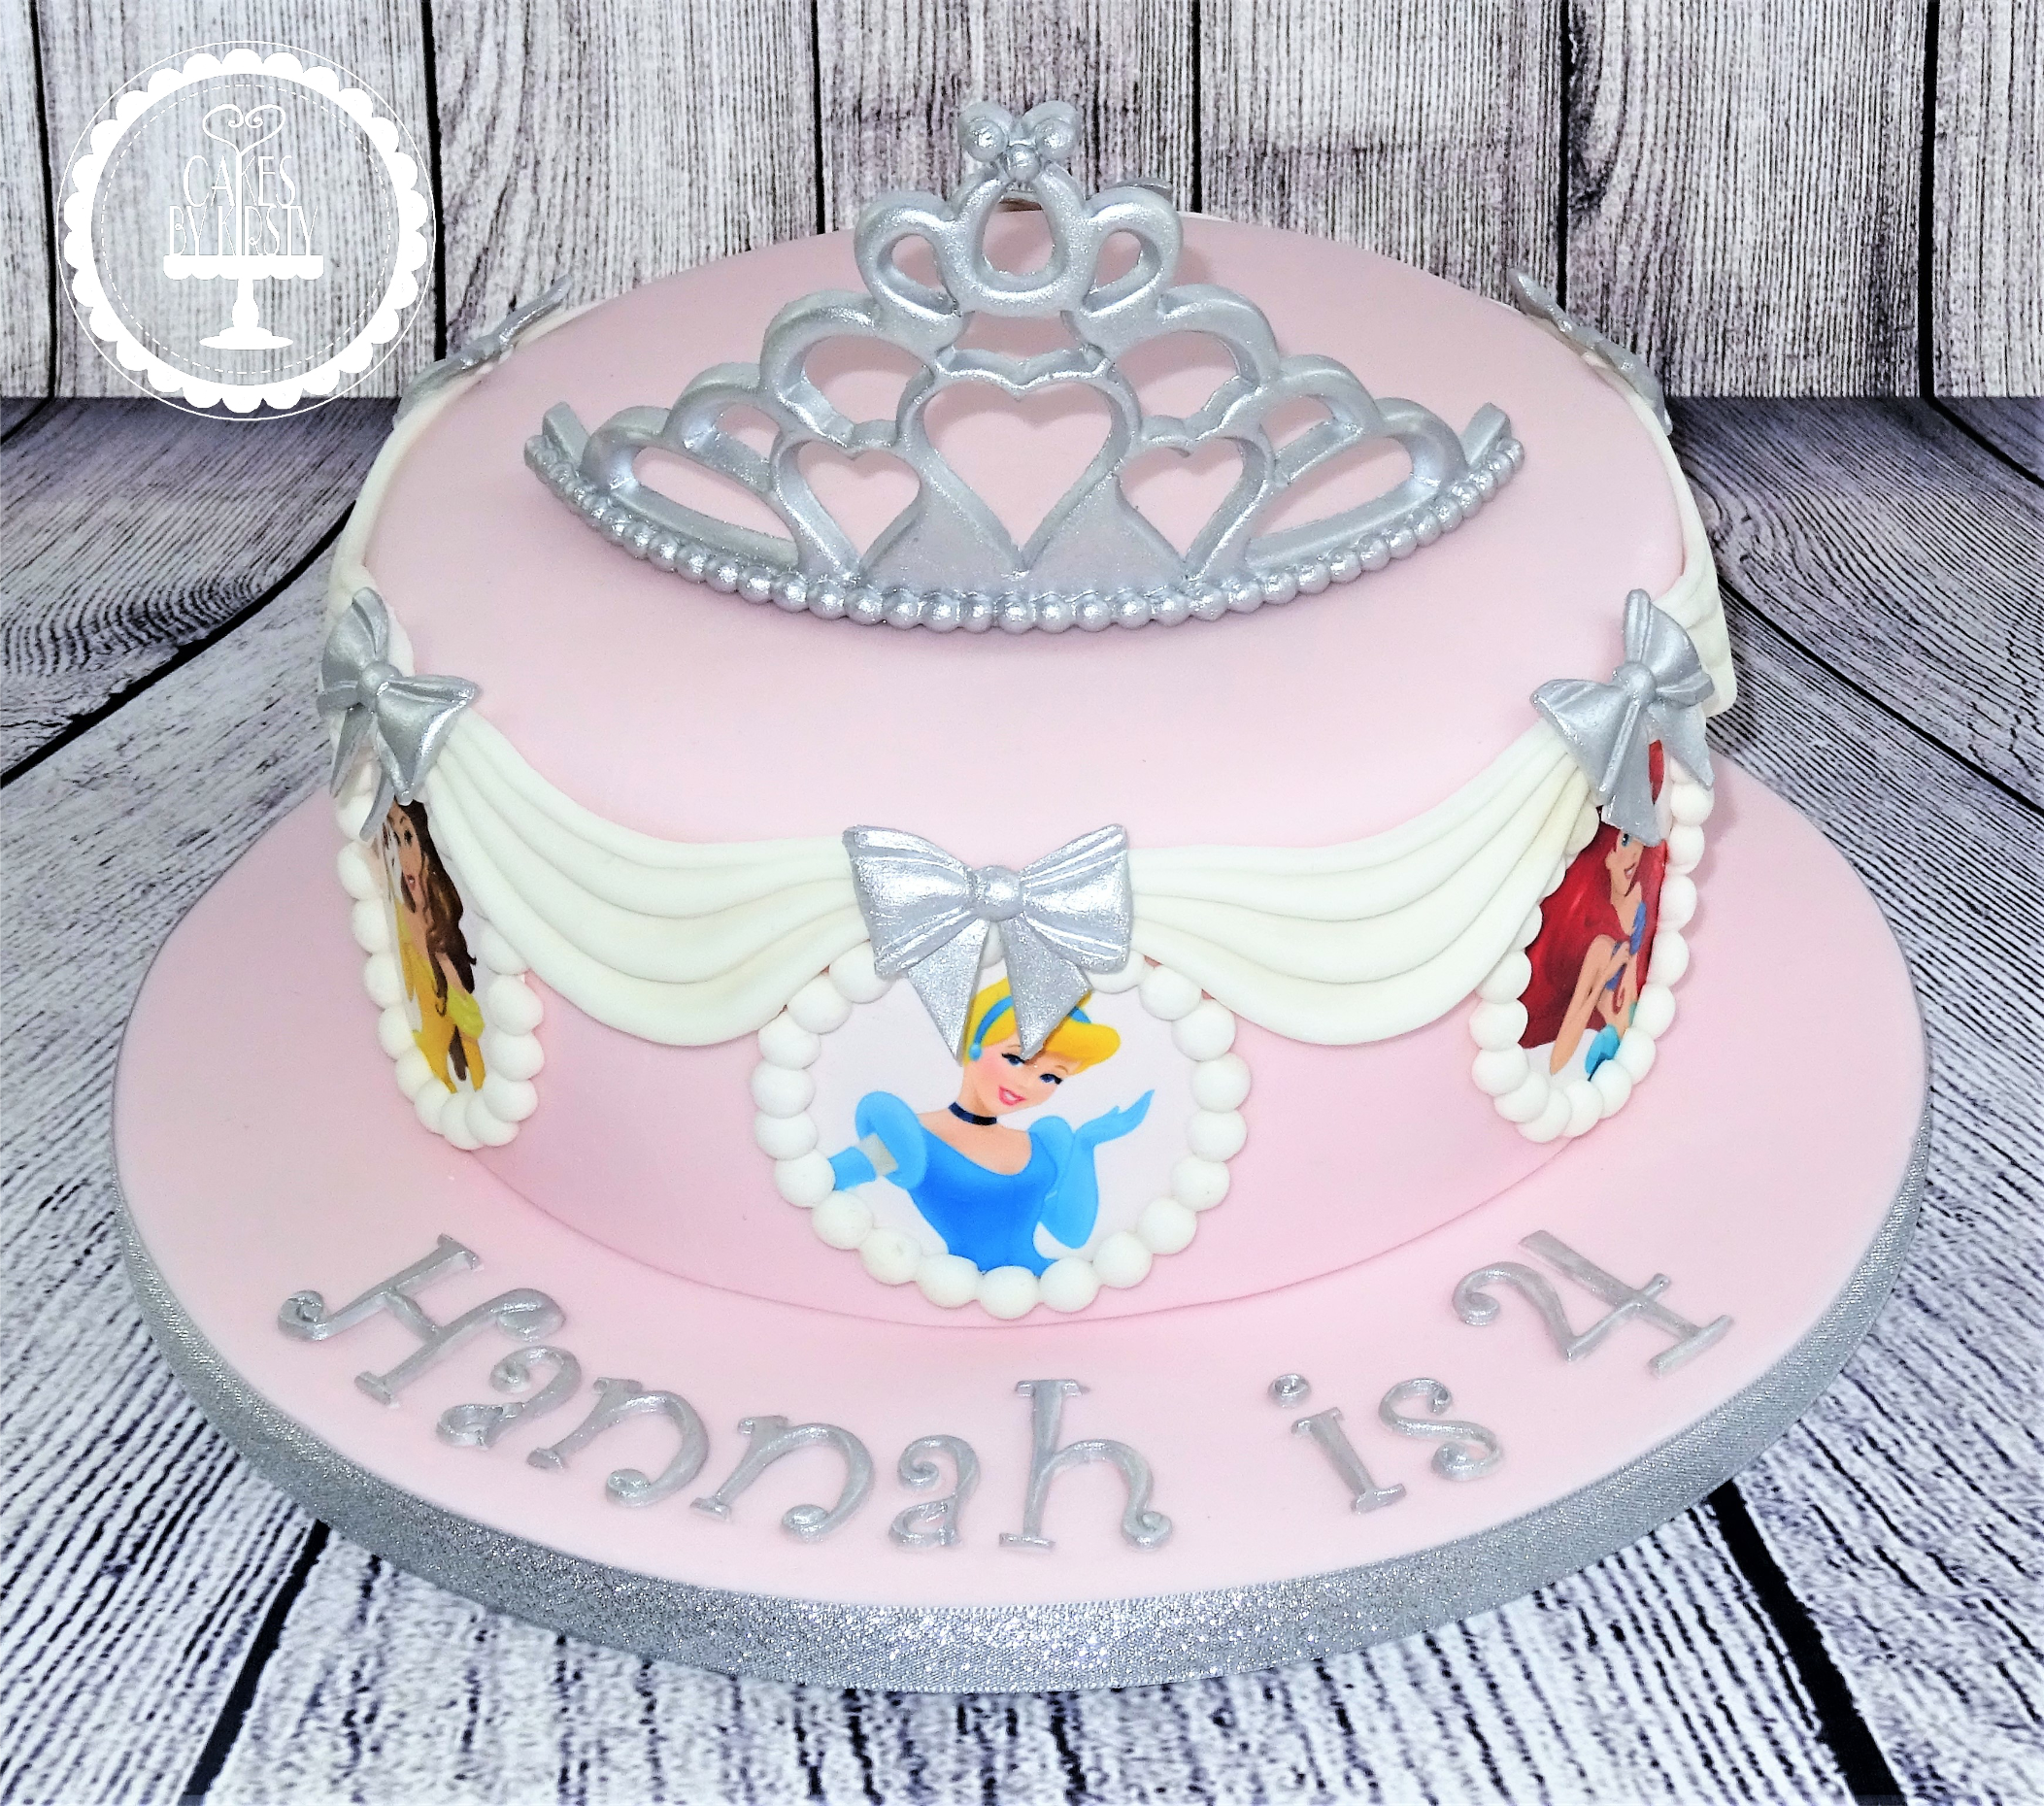 Disney Princess Tiara Cake